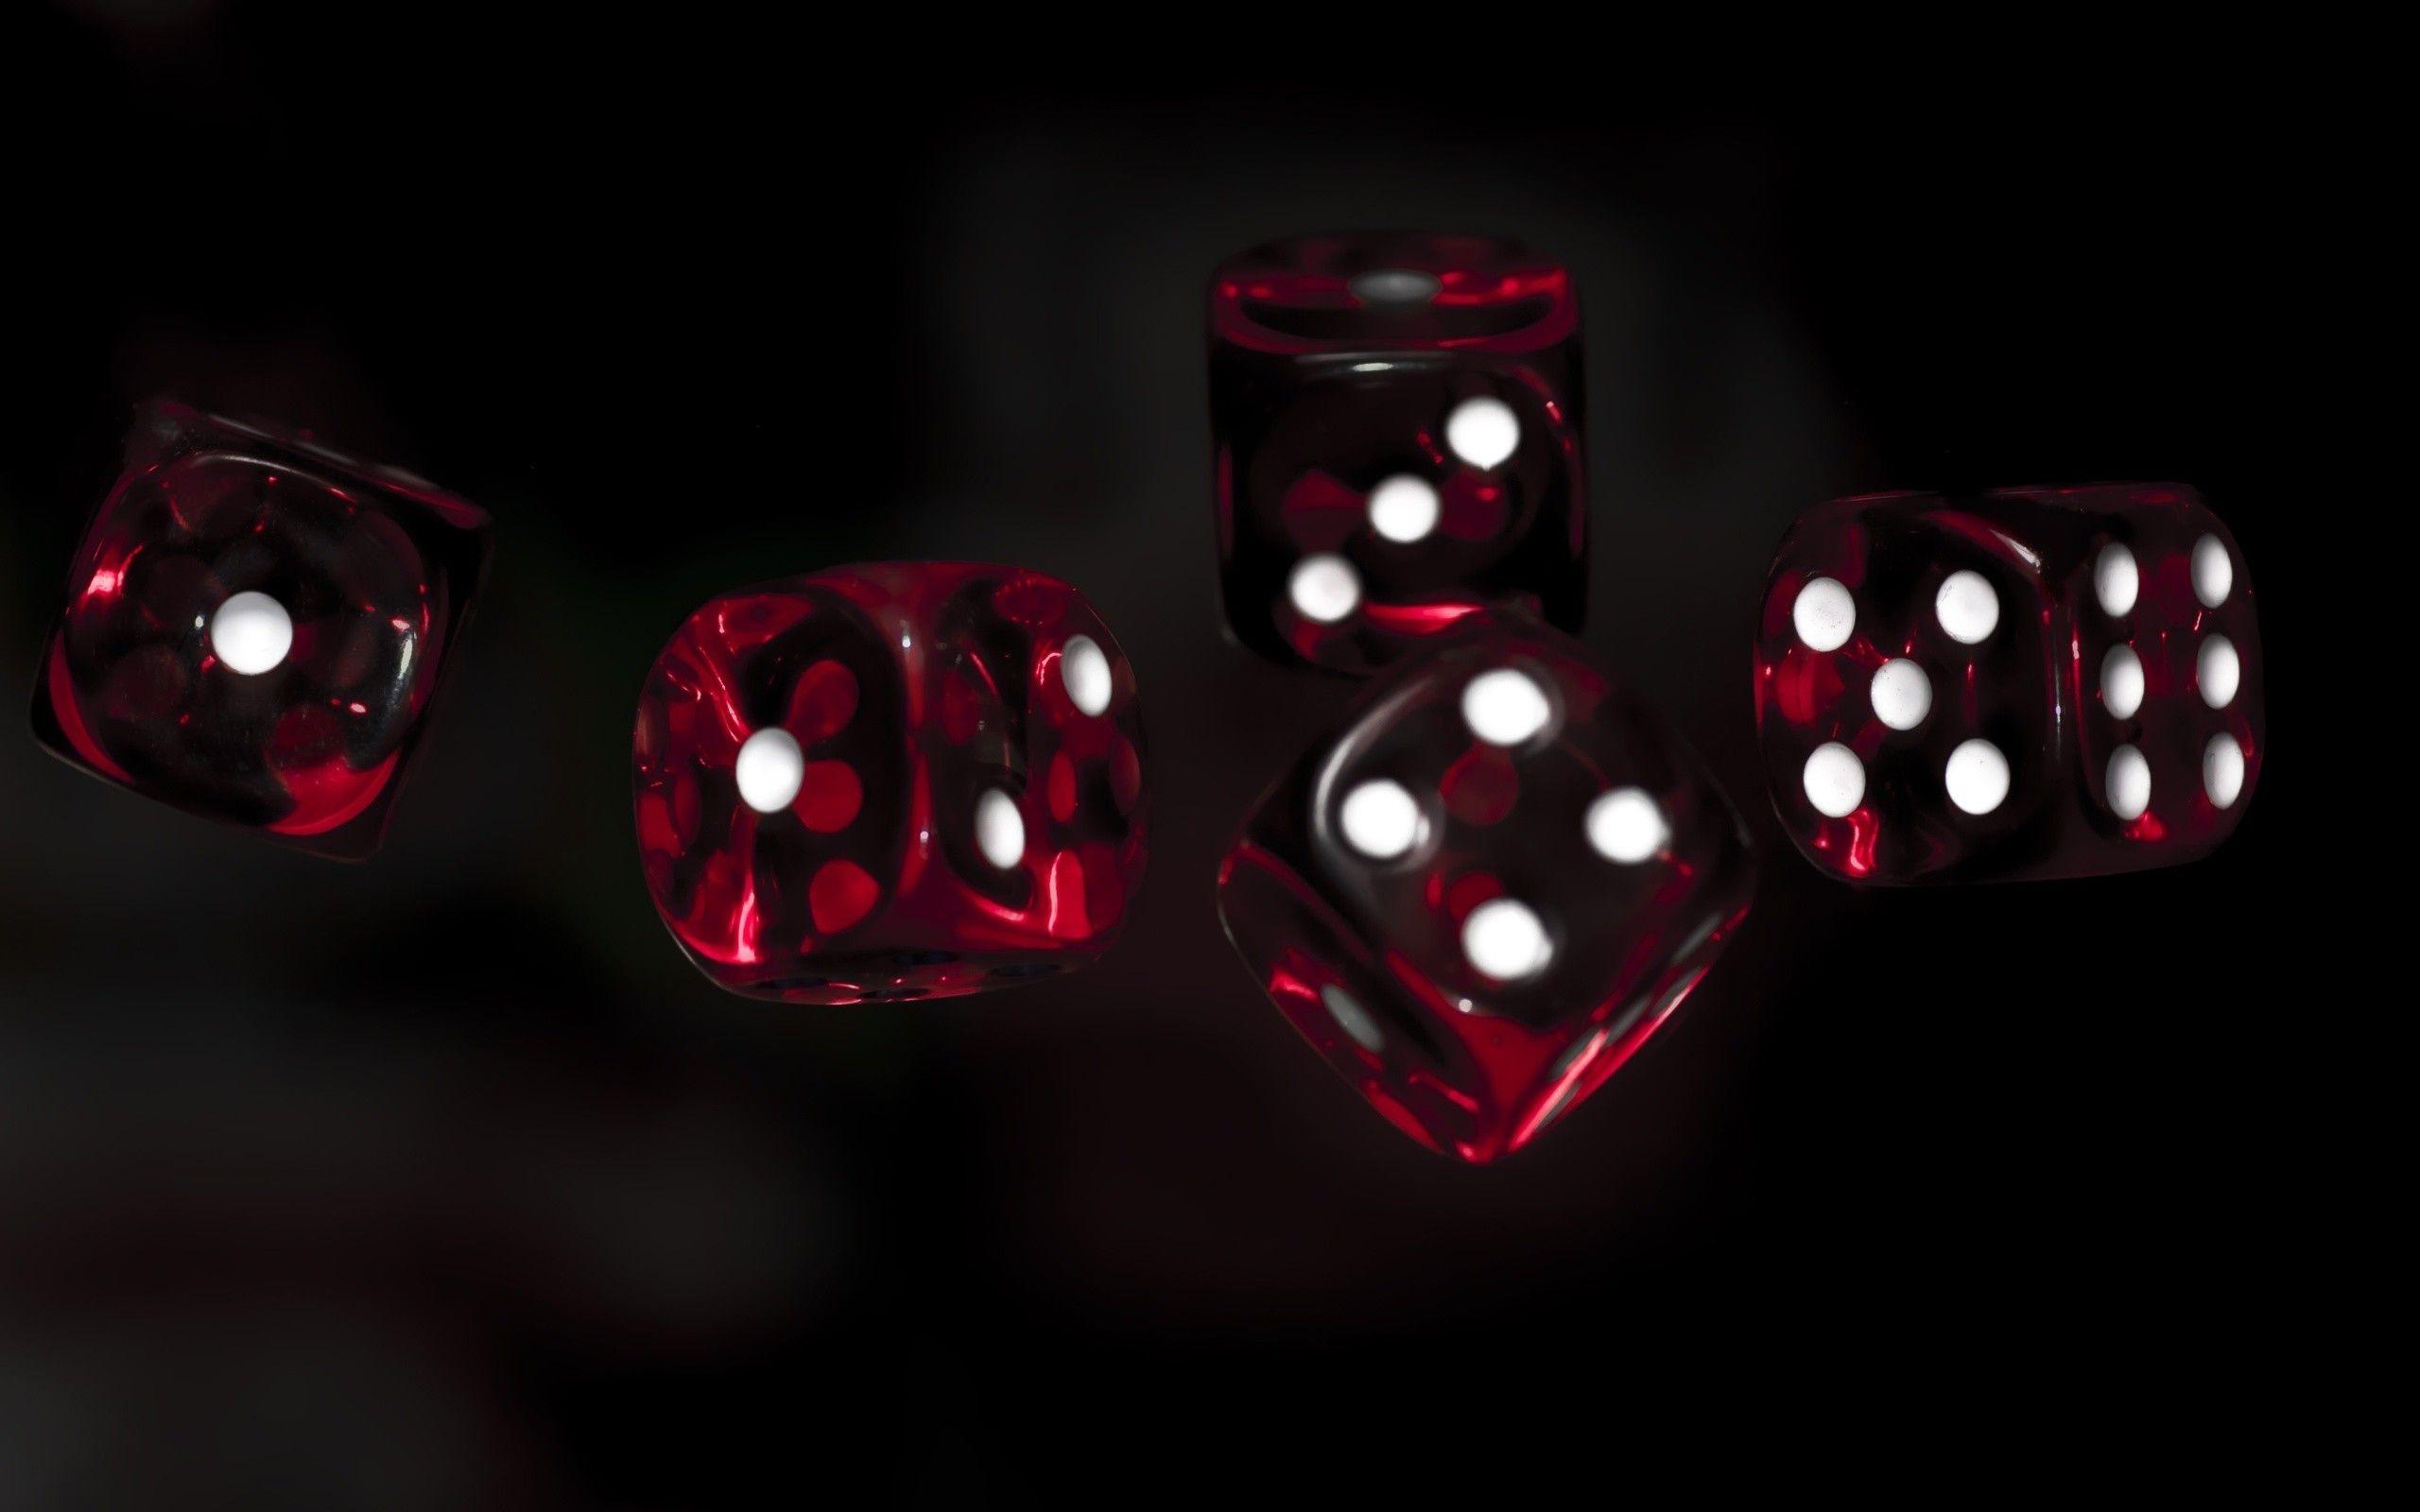 dice wallpaper hd for phone